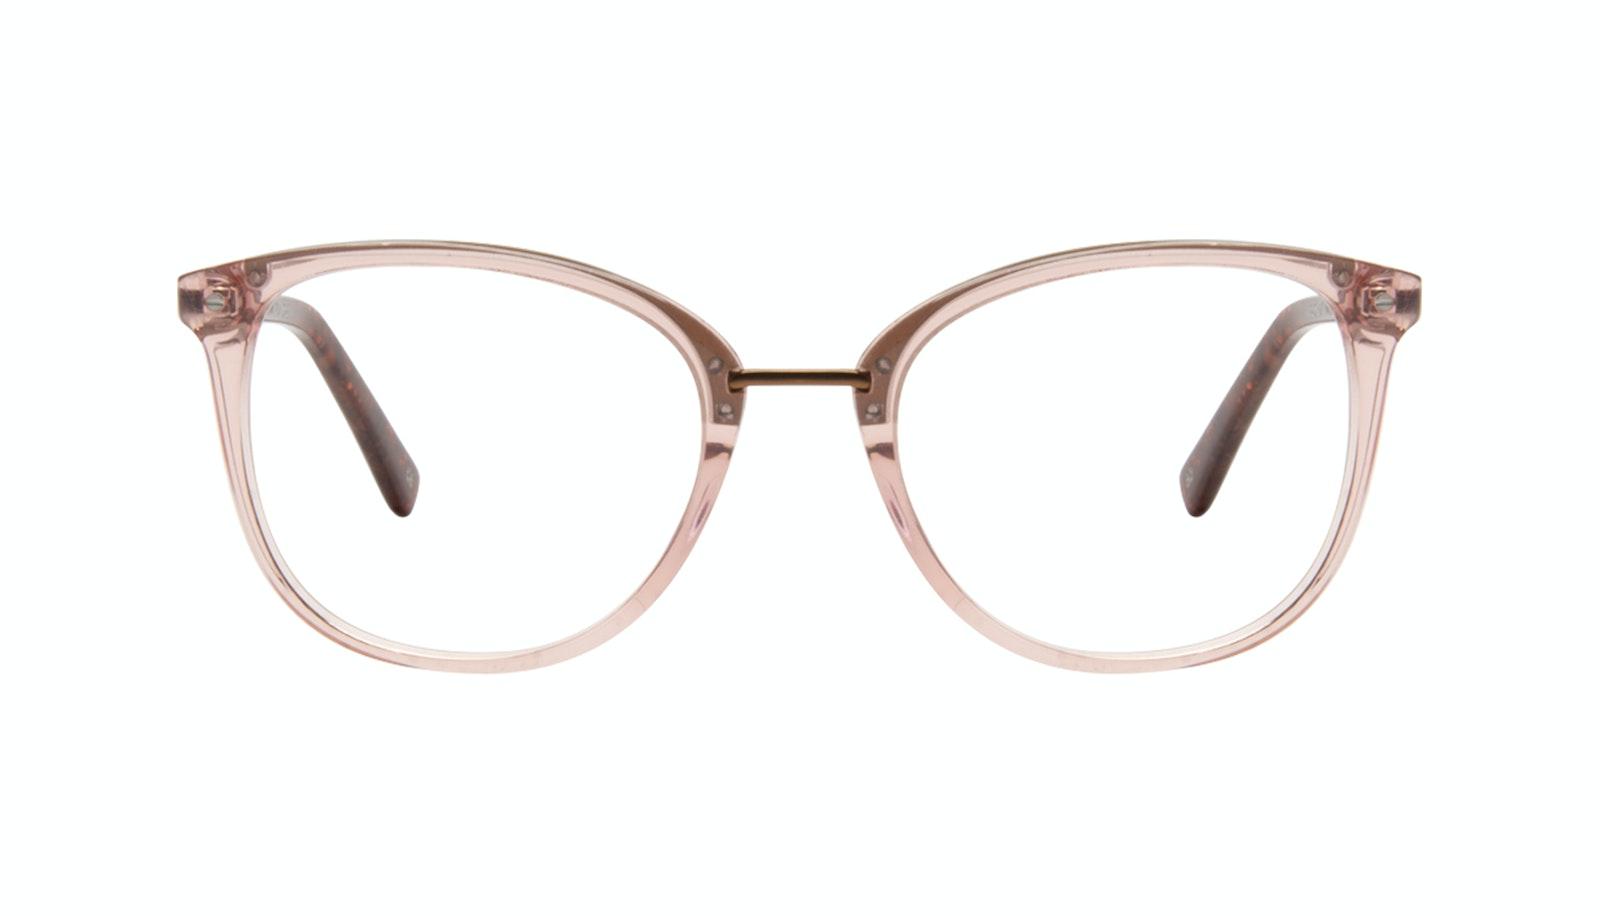 Affordable Fashion Glasses Square Round Eyeglasses Women Bella Rose